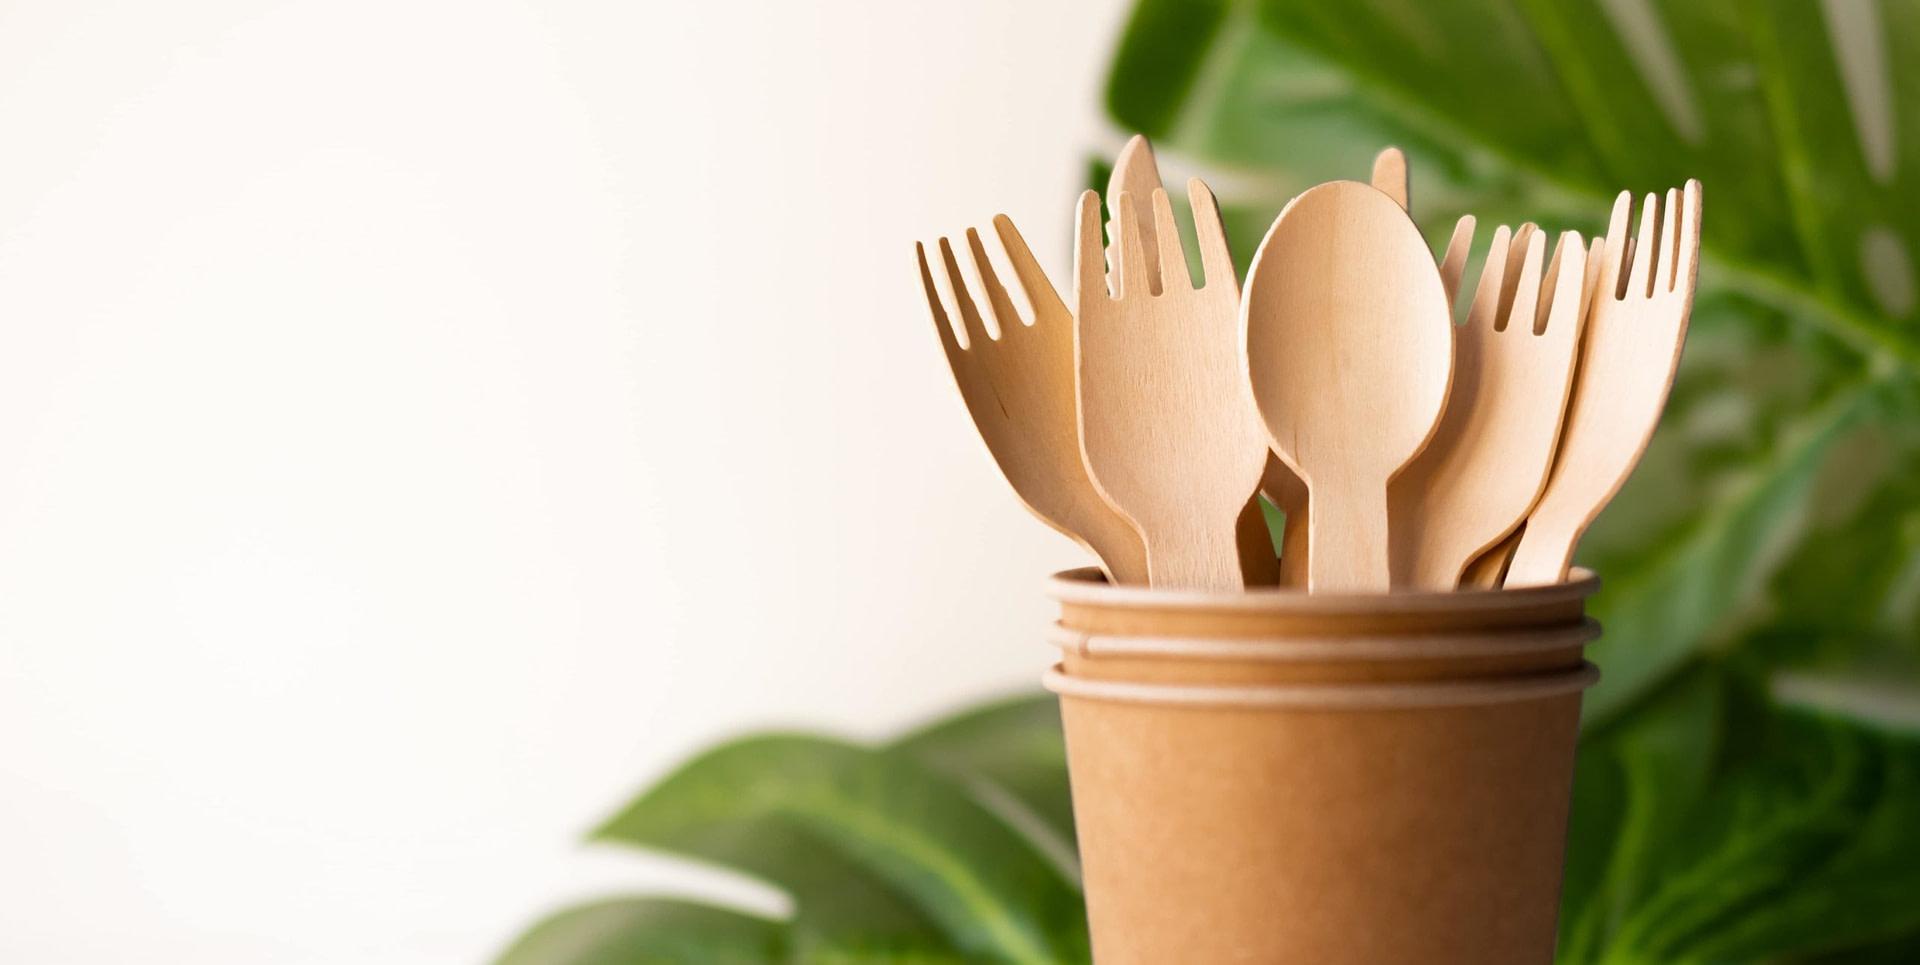 Sustain wooden cutlery